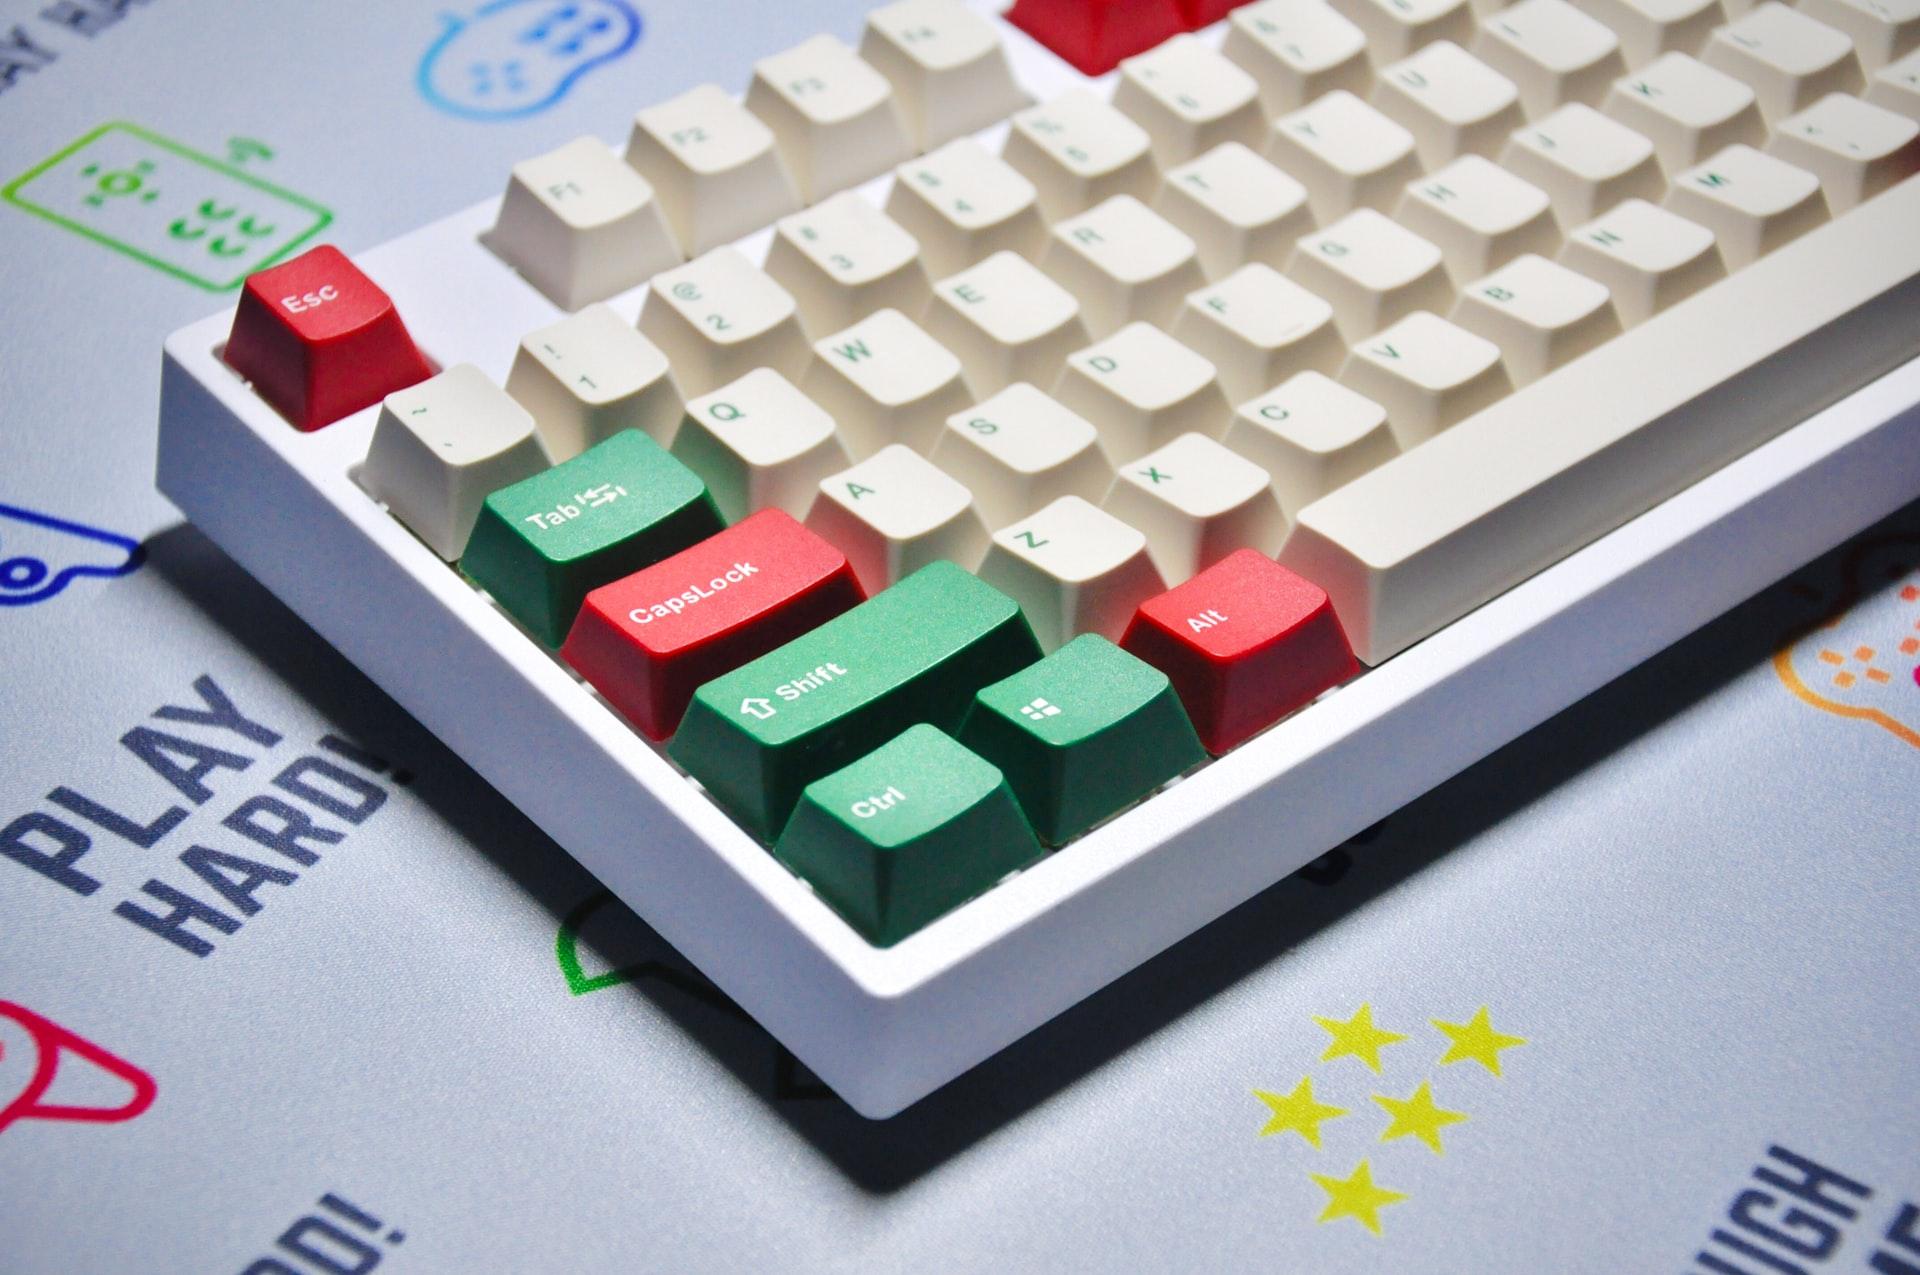 raccourcis-tabulation-tab-mac-avec-touche-clavier-jay-zhang